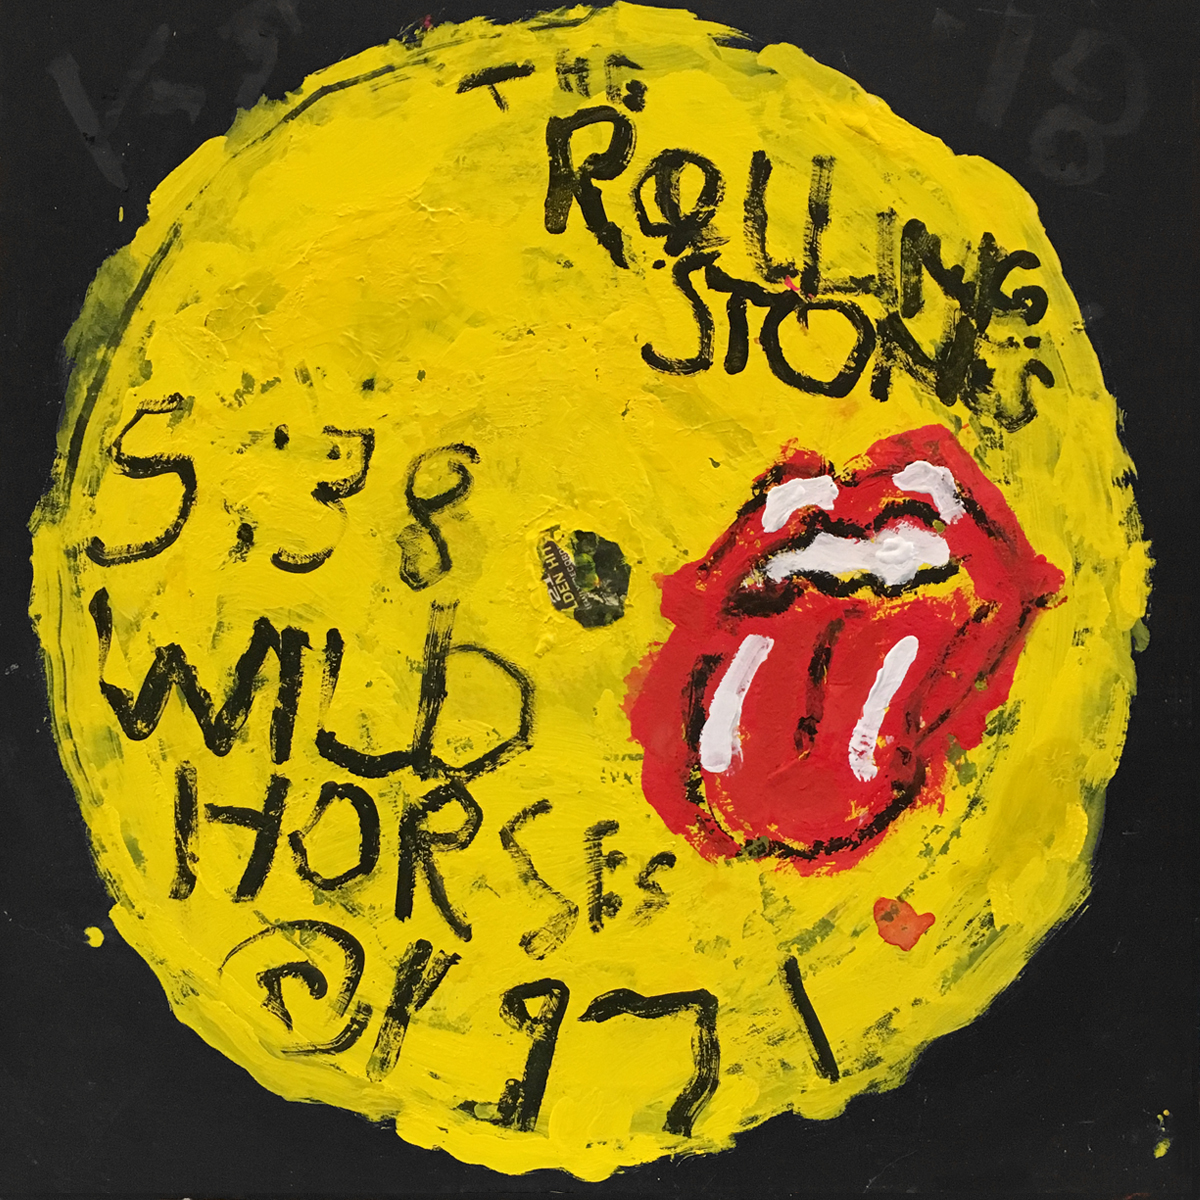 Rolling Stones / Wild horses